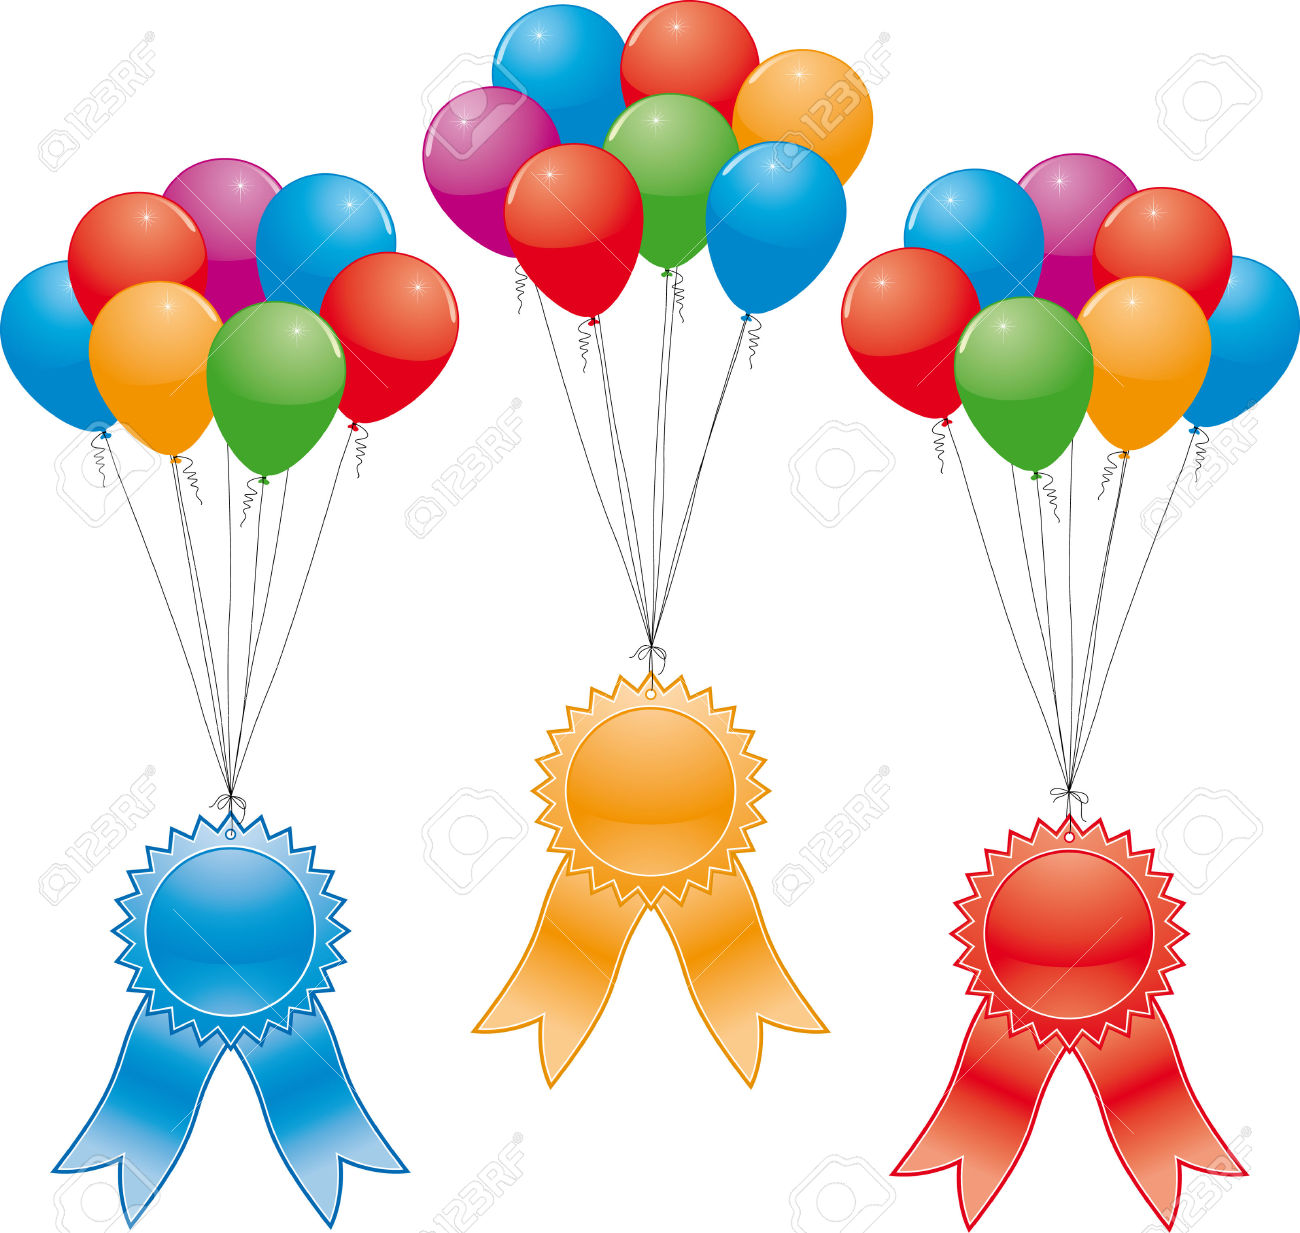 Free Award Ceremony Cliparts, Download Free Clip Art, Free Clip Art.